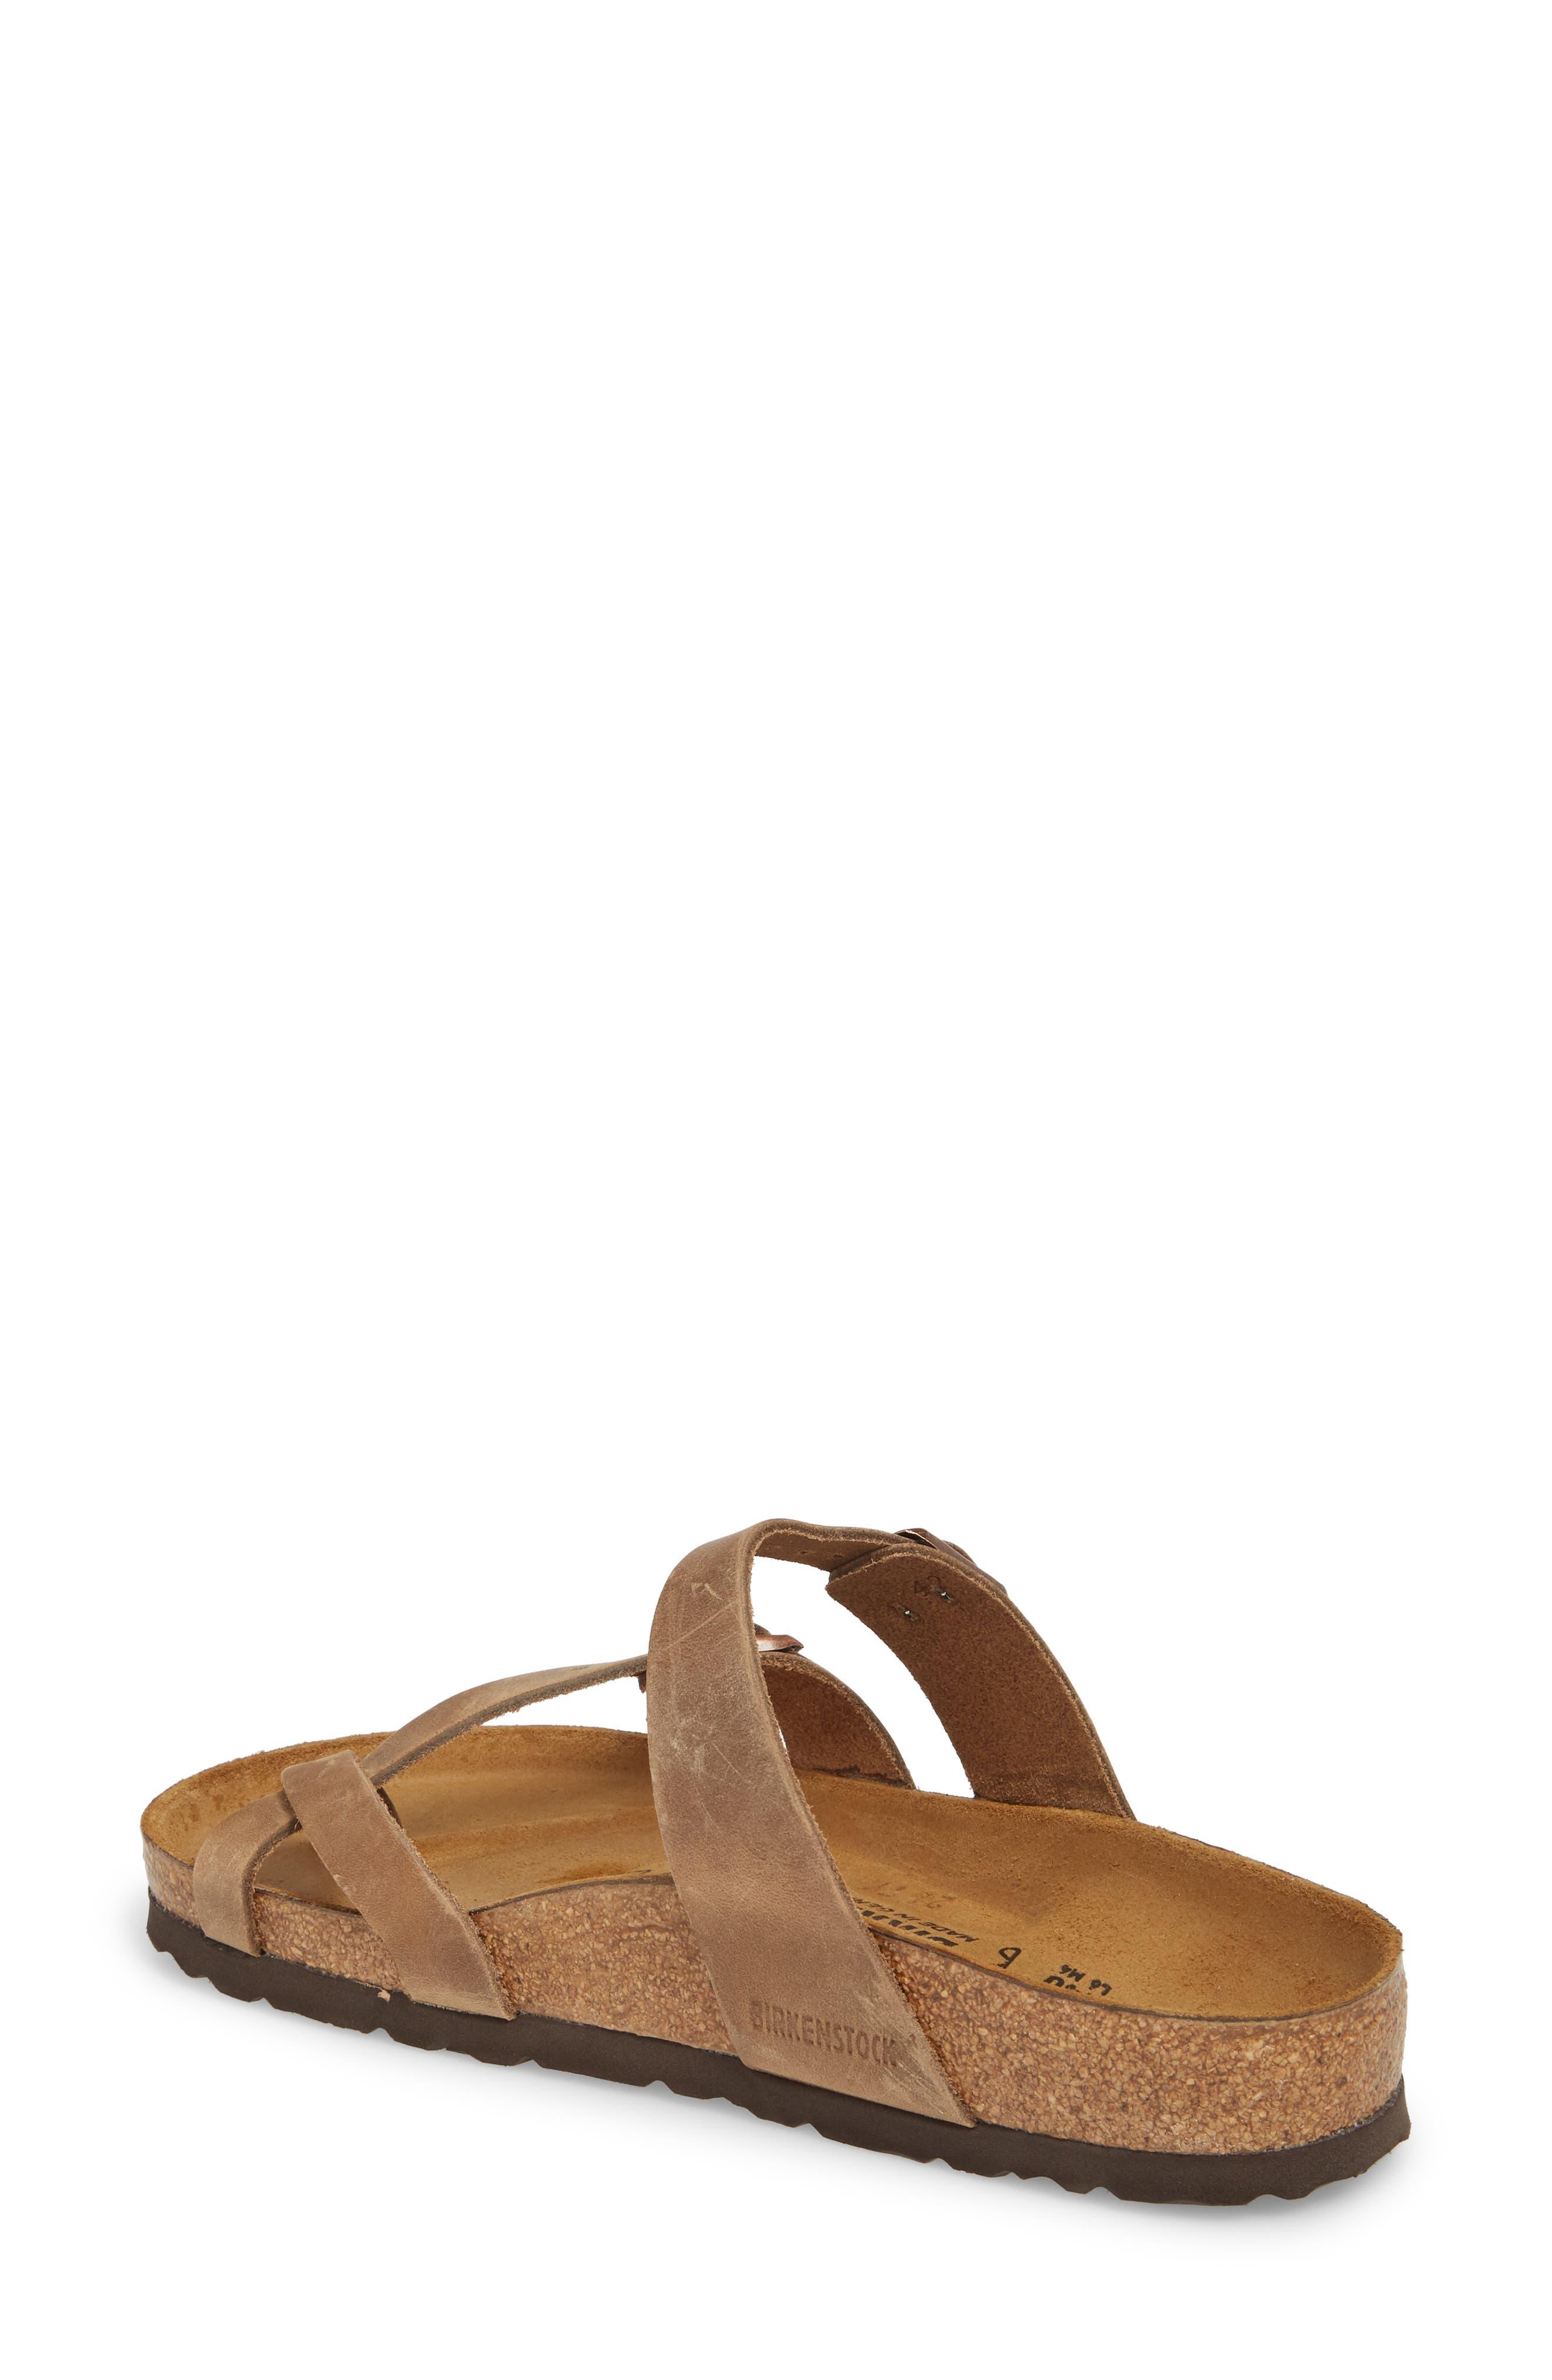 Mayari Slide Sandal,                             Alternate thumbnail 2, color,                             Tobacco Oiled Leather